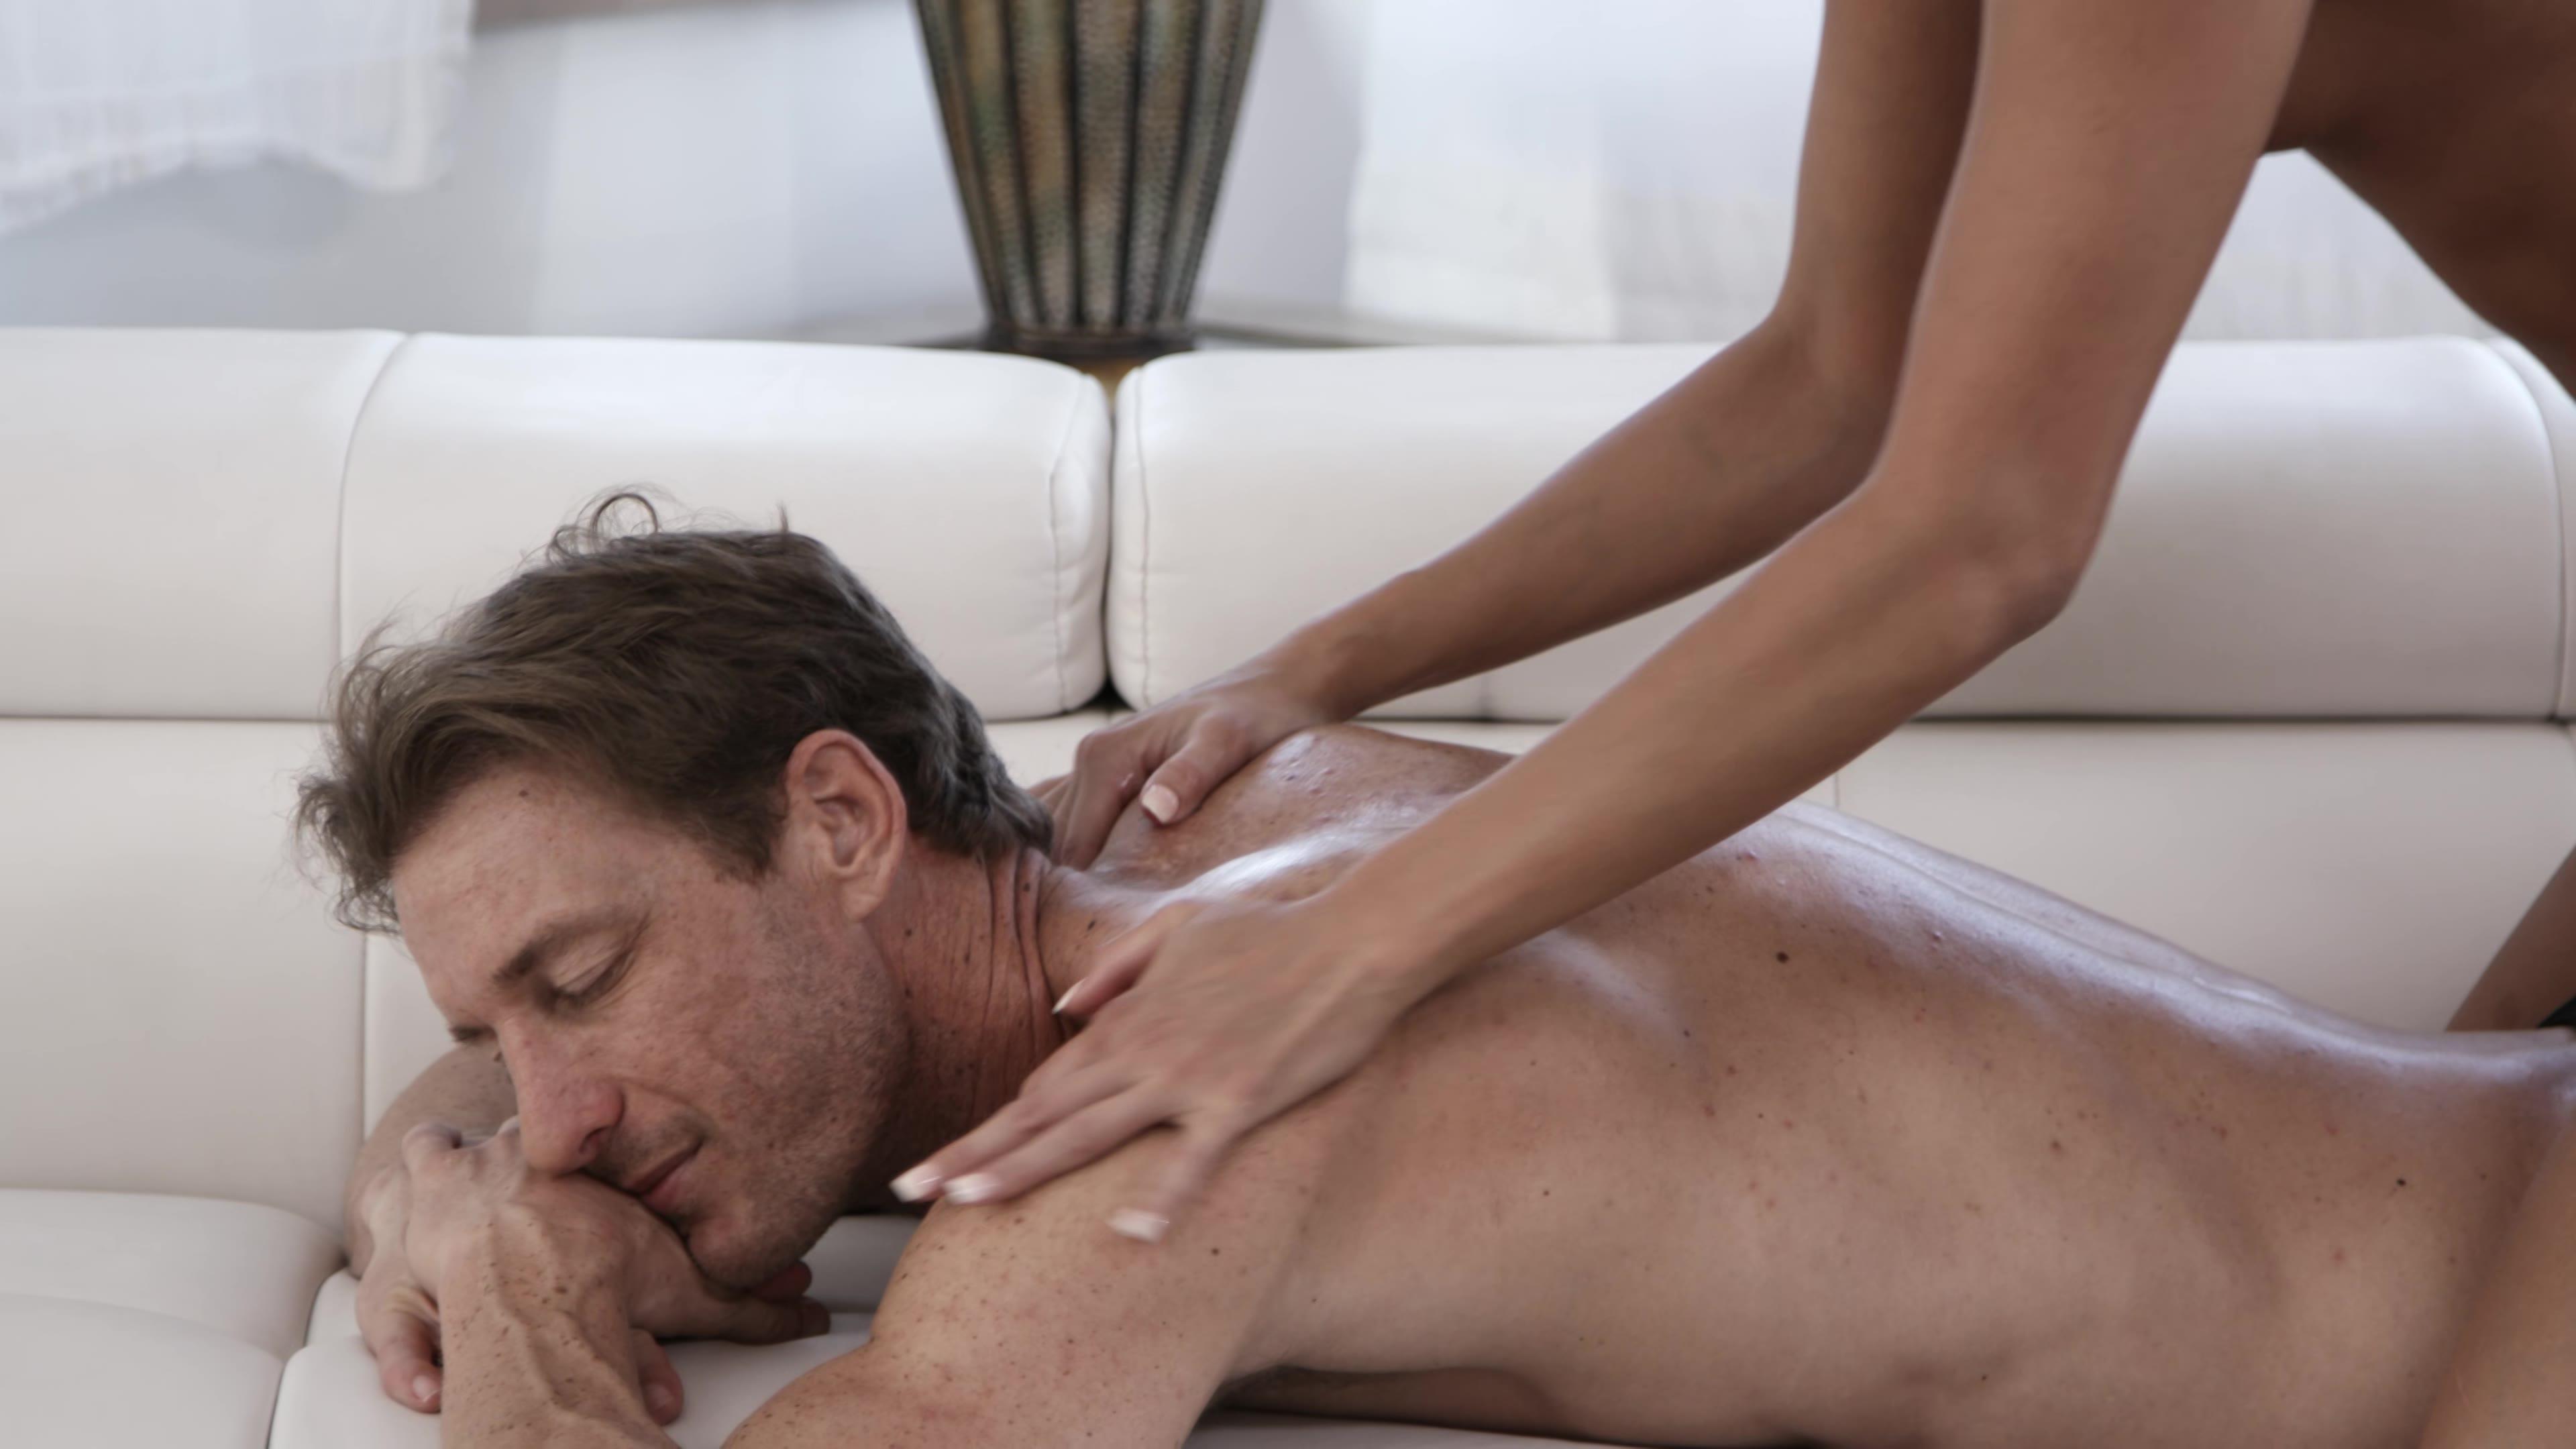 Asiatic Massage Porn bareback asian massage (2019) | adult dvd empire